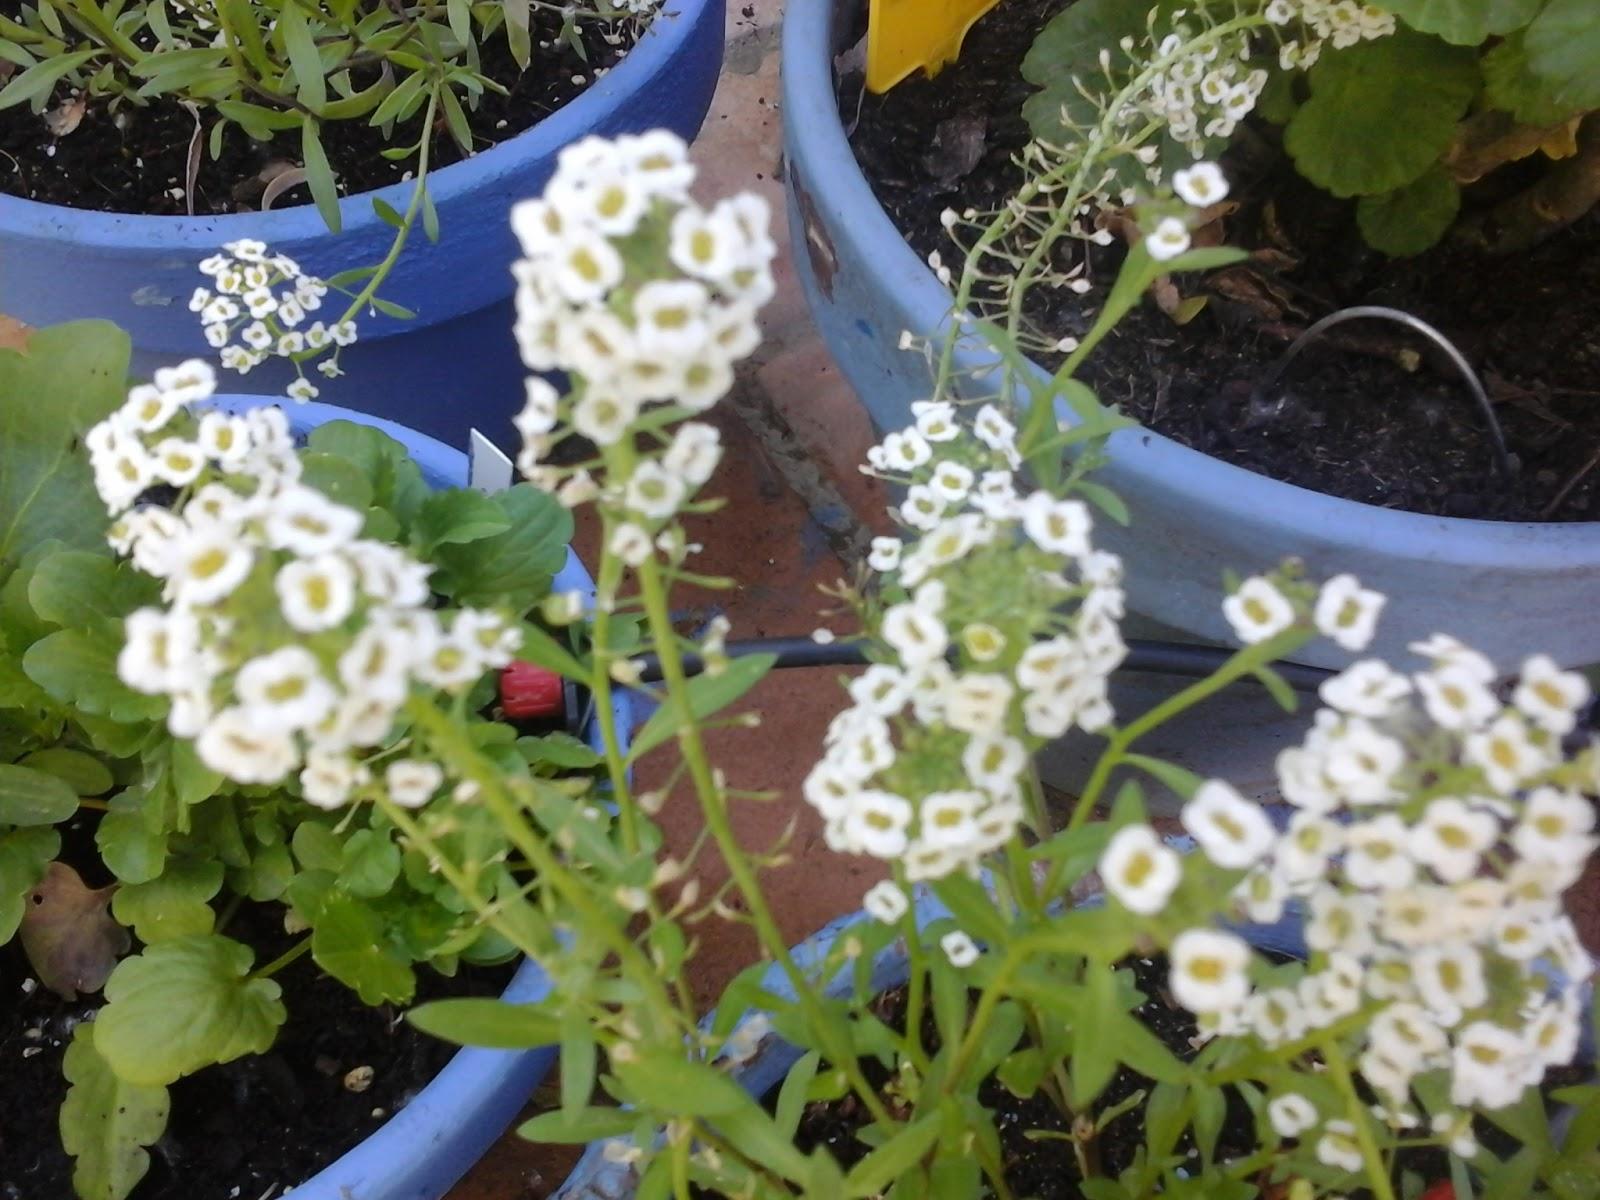 Jazmin azul cuidados perfect cultivo de hortensias gua for Hortensias cultivo y cuidados